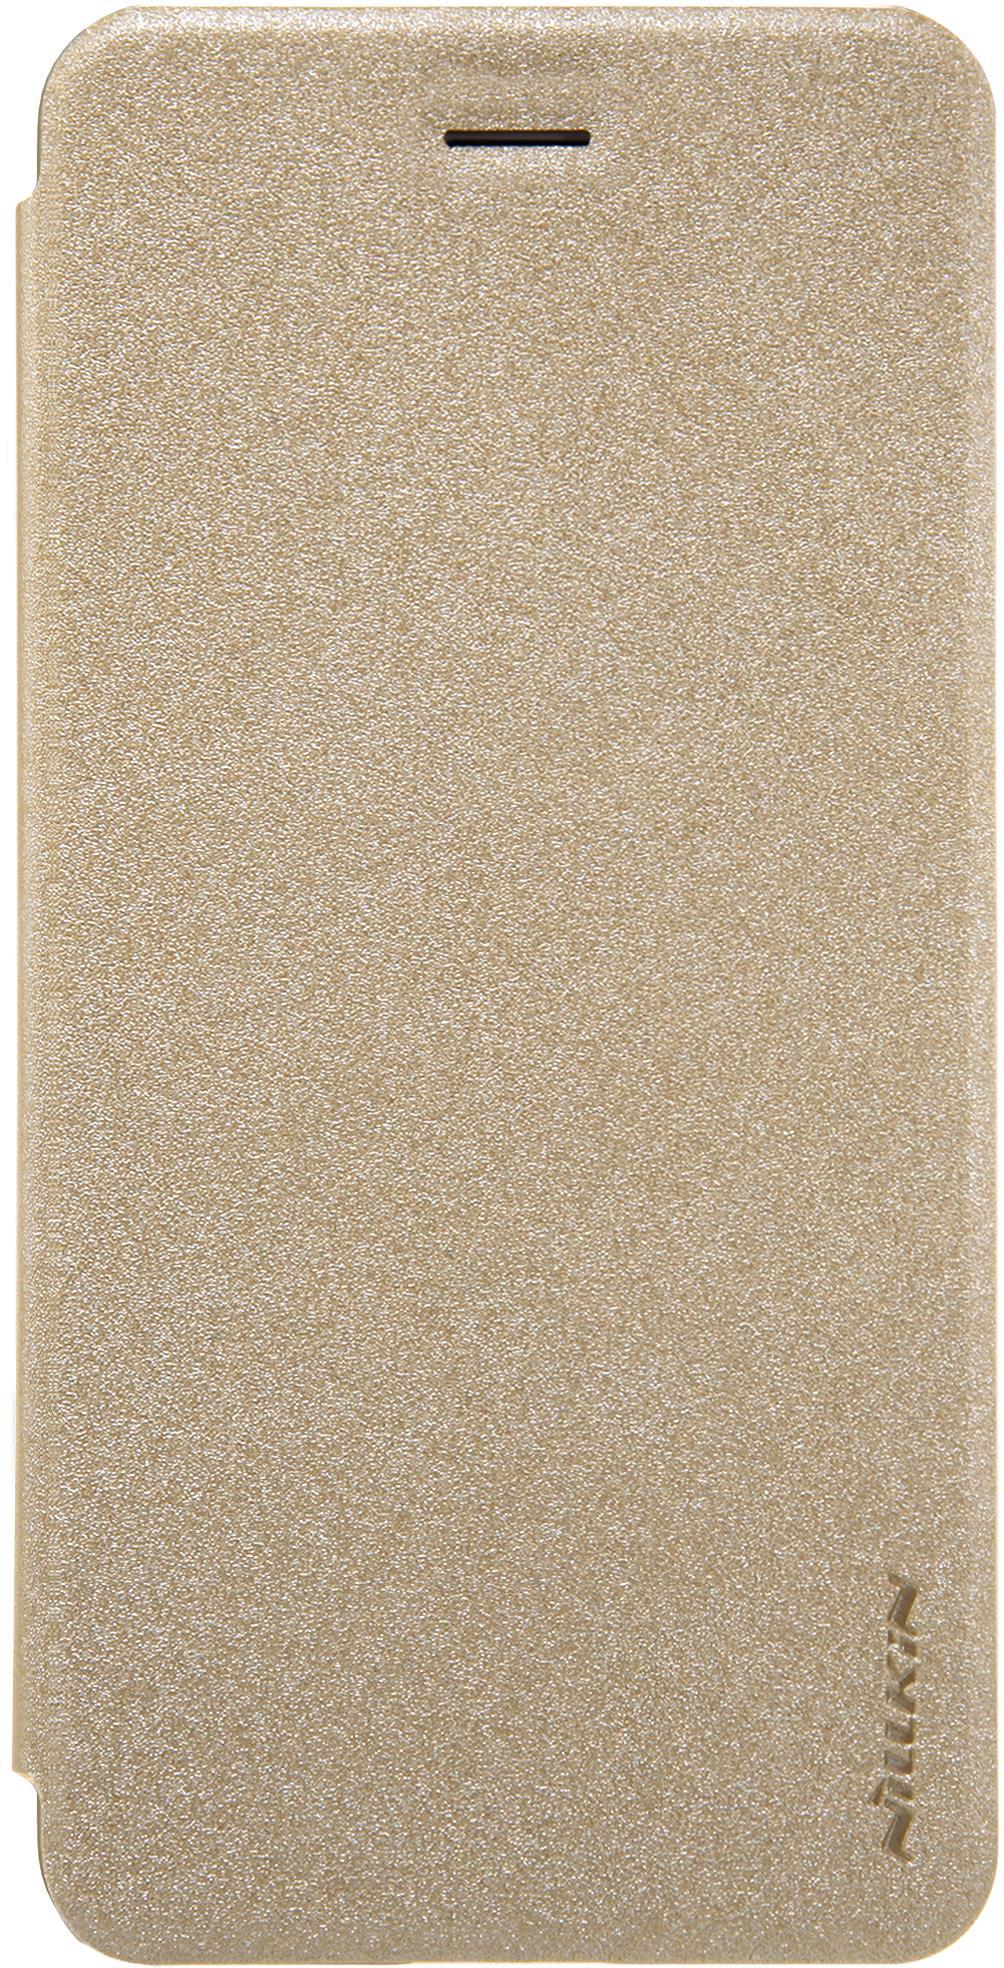 Чехол для сотового телефона Nillkin T-N-HH9-009, золотой чехол nillkin sparkle leather case для apple iphone 6 plus цвет белый t n aiphone6p 009